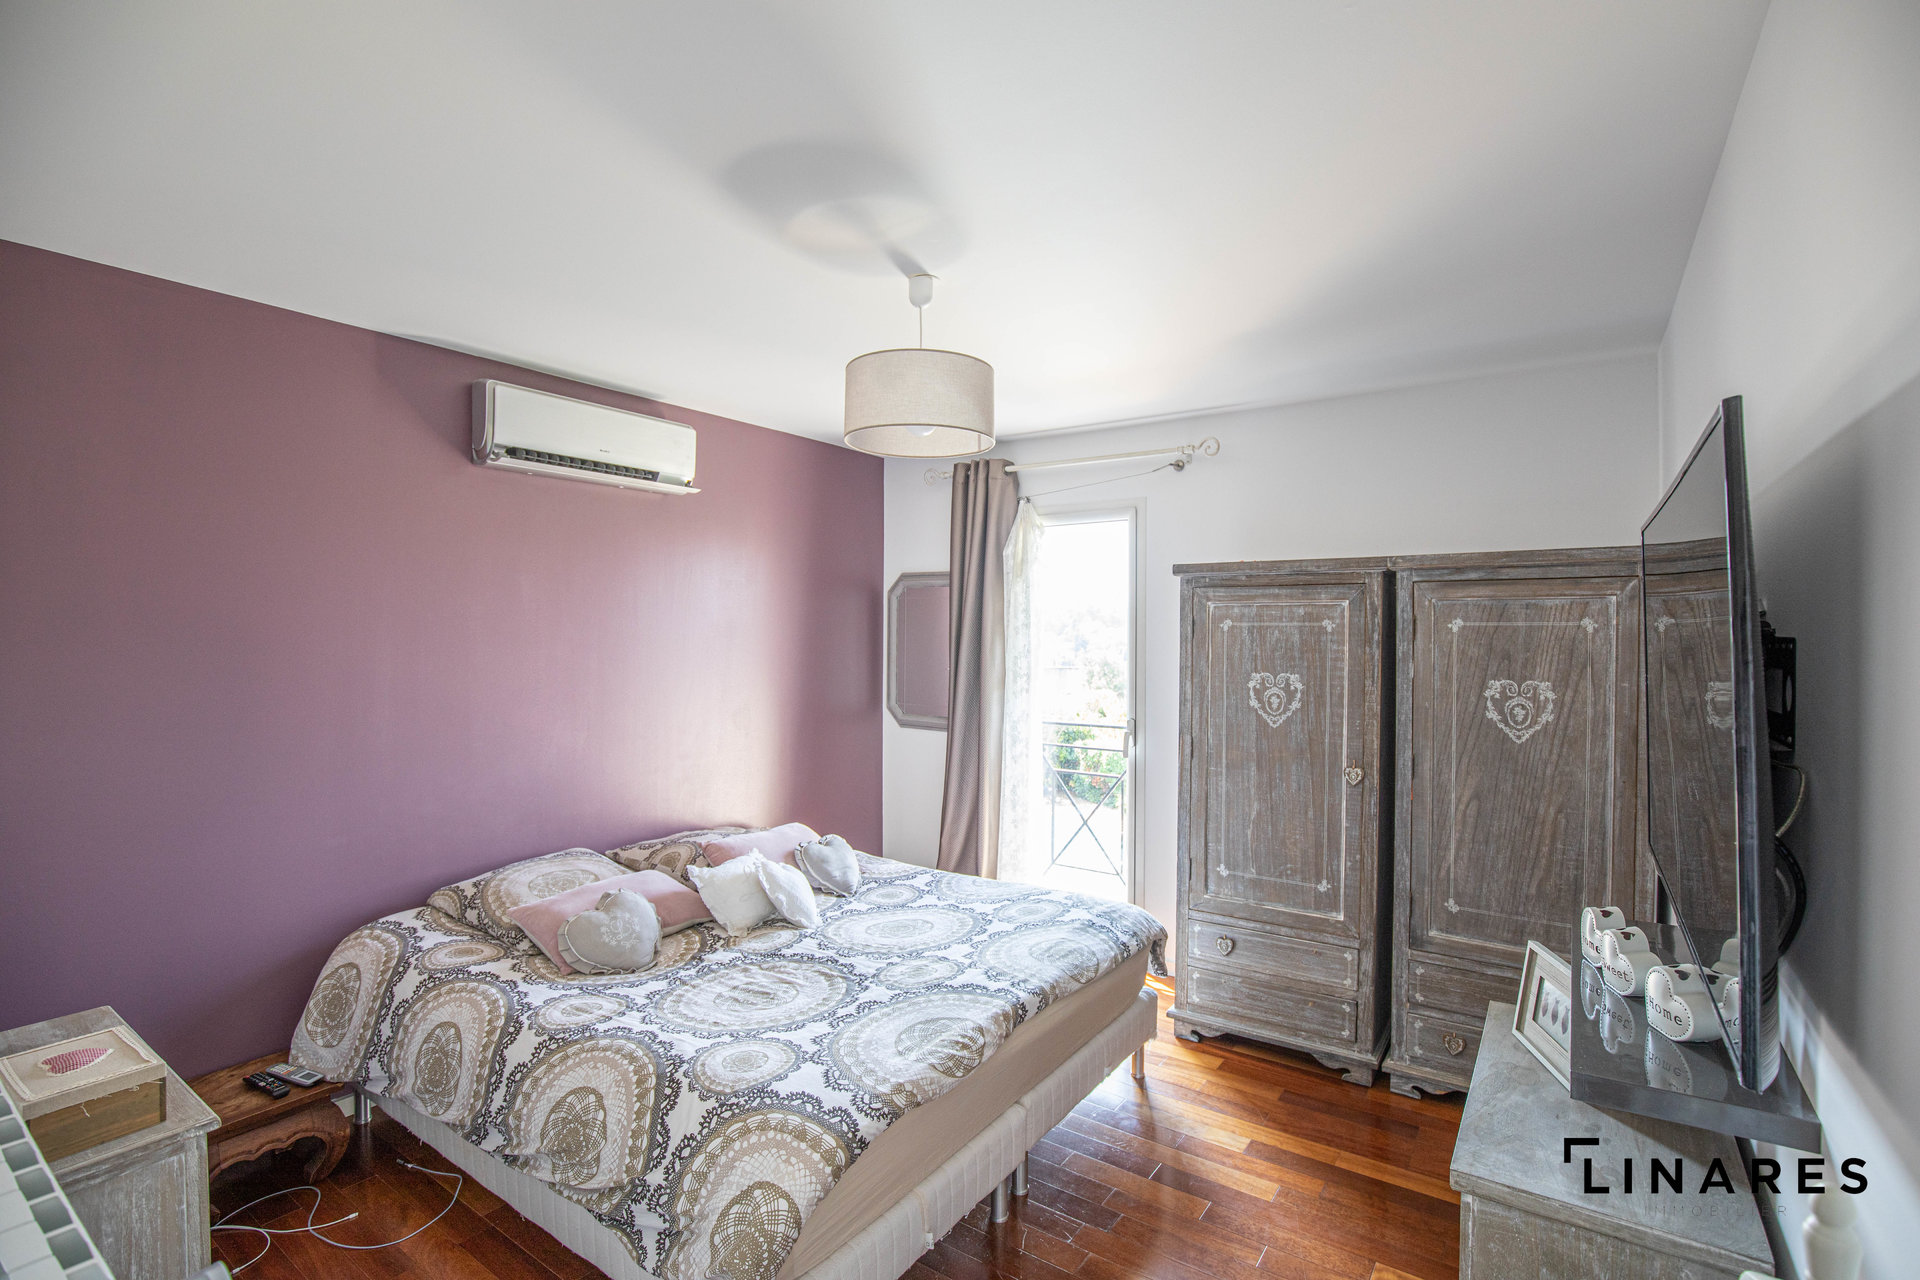 GARDEN HOUSE - Villa T6 de 193m2 - Terrain 849m2